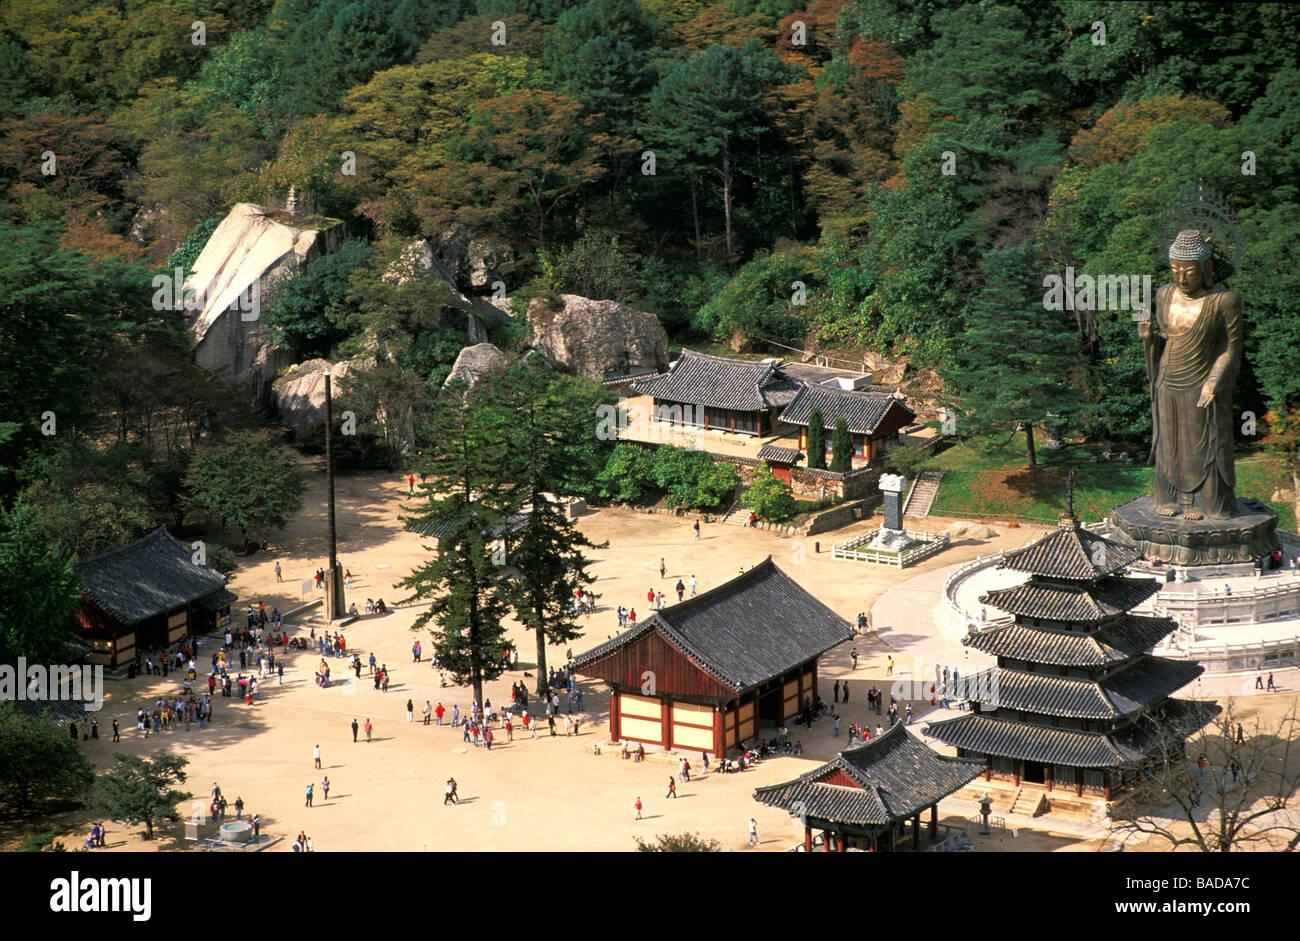 South Korea, Songnisan National Park, Popchu Sa Monastery - Stock Image